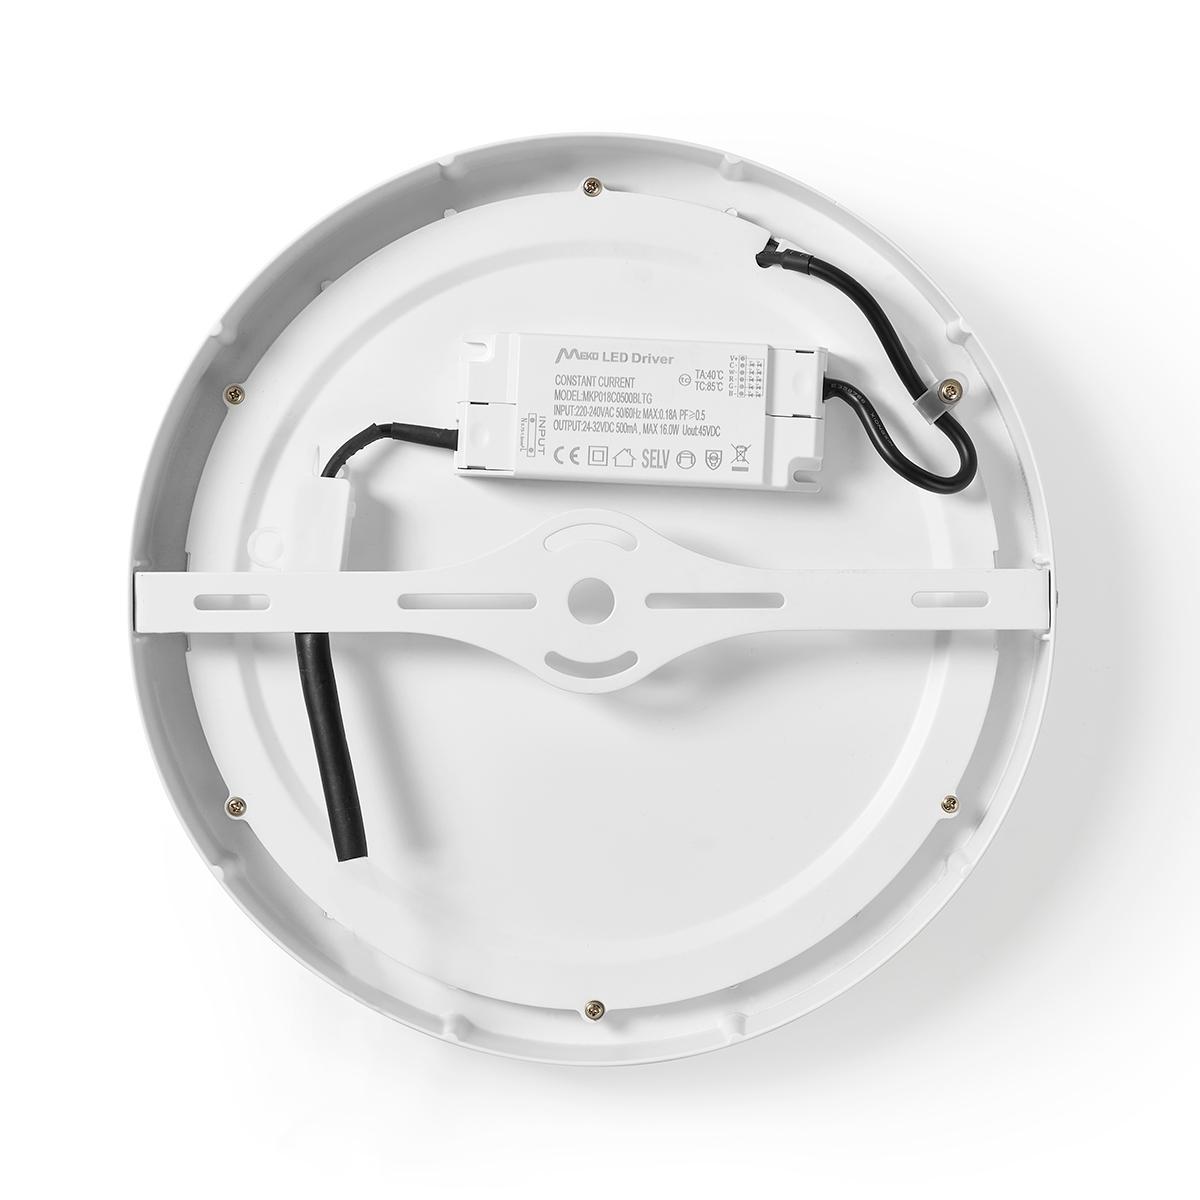 WiFi - Smart LED plafondlamp - 18 watt - 30cm - warm tot koel wit - 18 watt - dimbaar - app besturing - achterkant